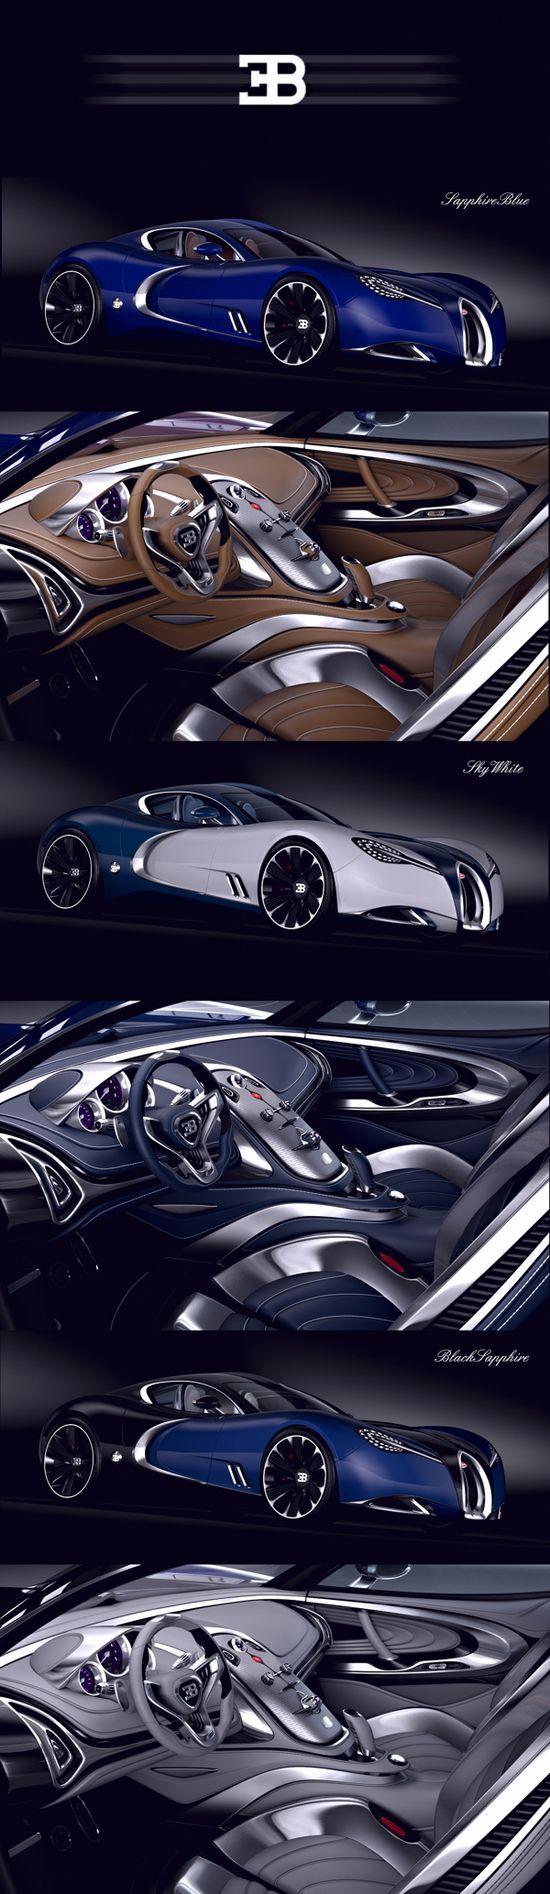 Bugatti #ferrari vs lamborghini #sport cars